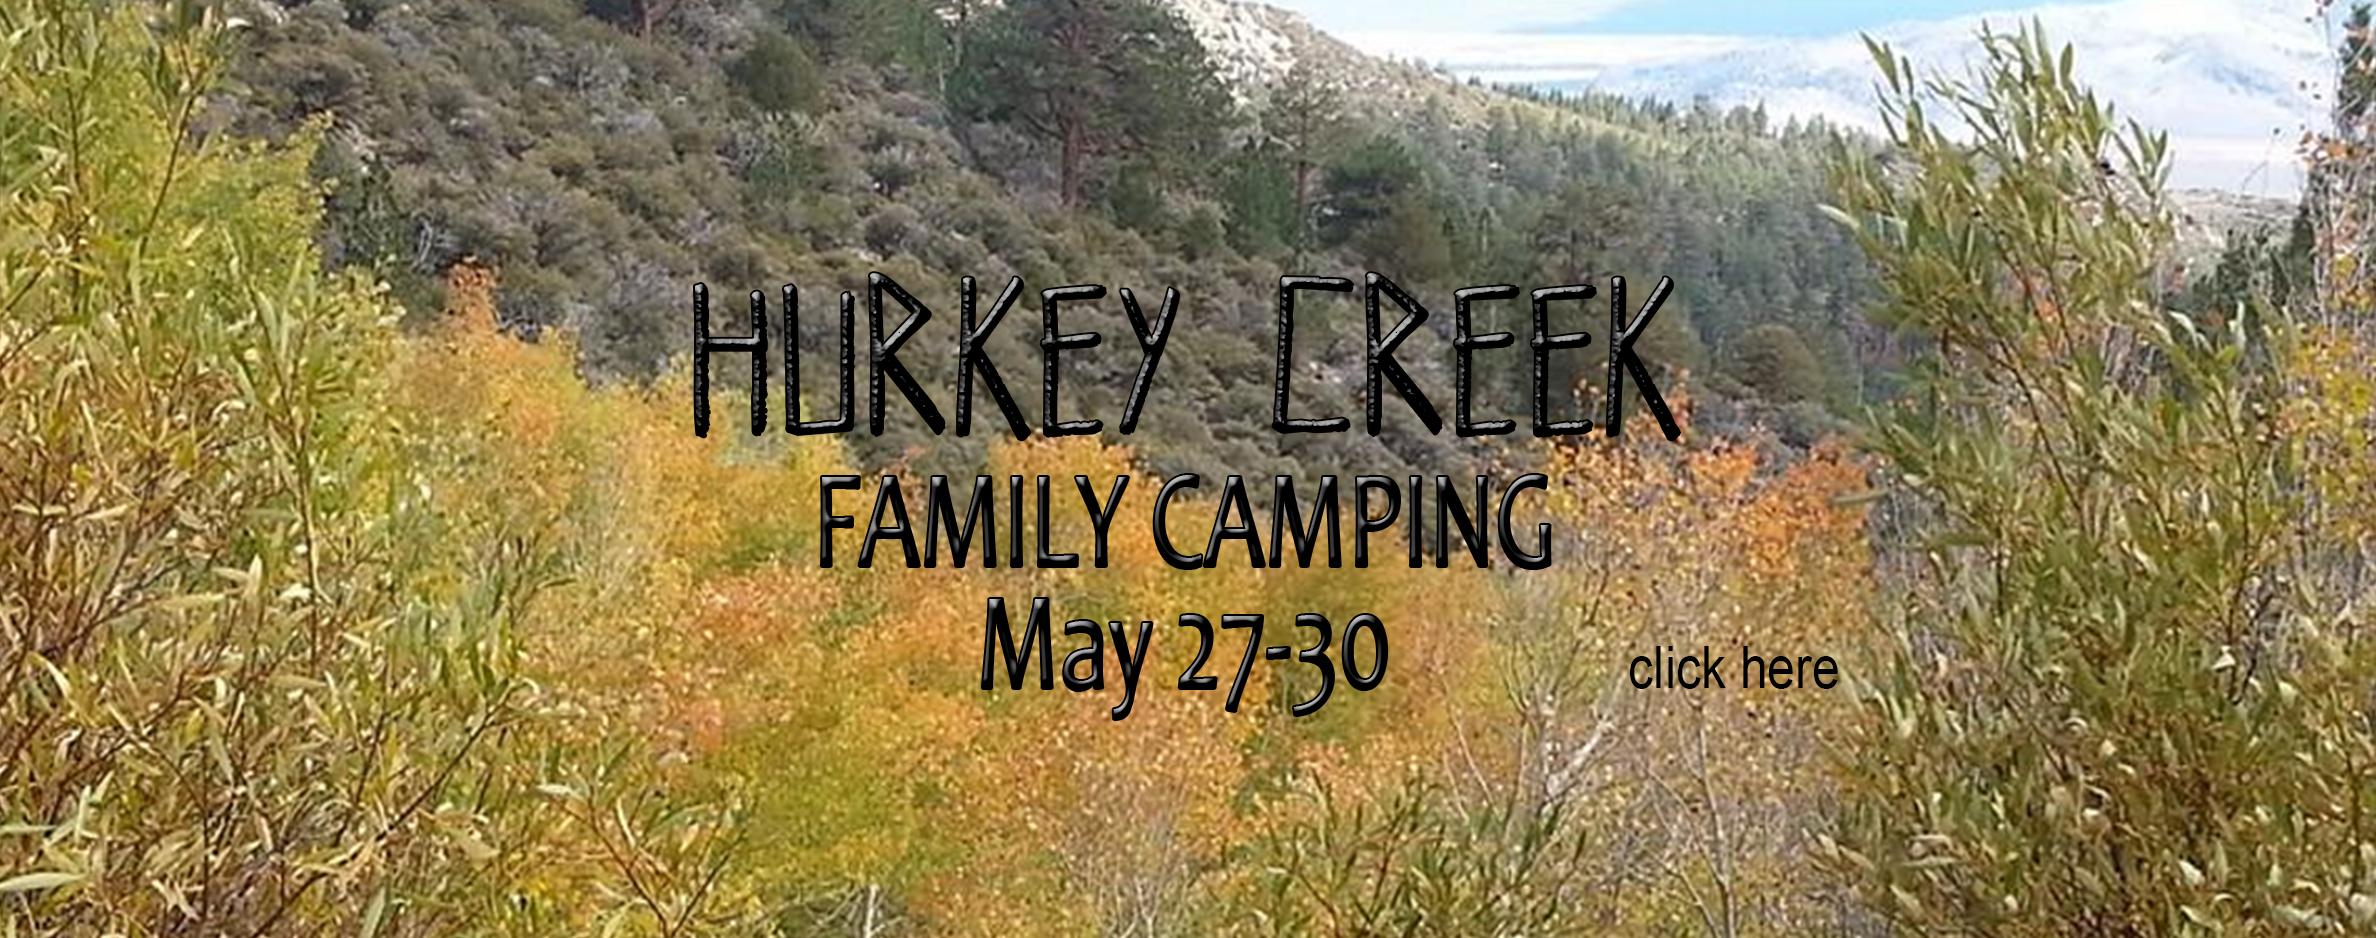 hurkey-creek-banner